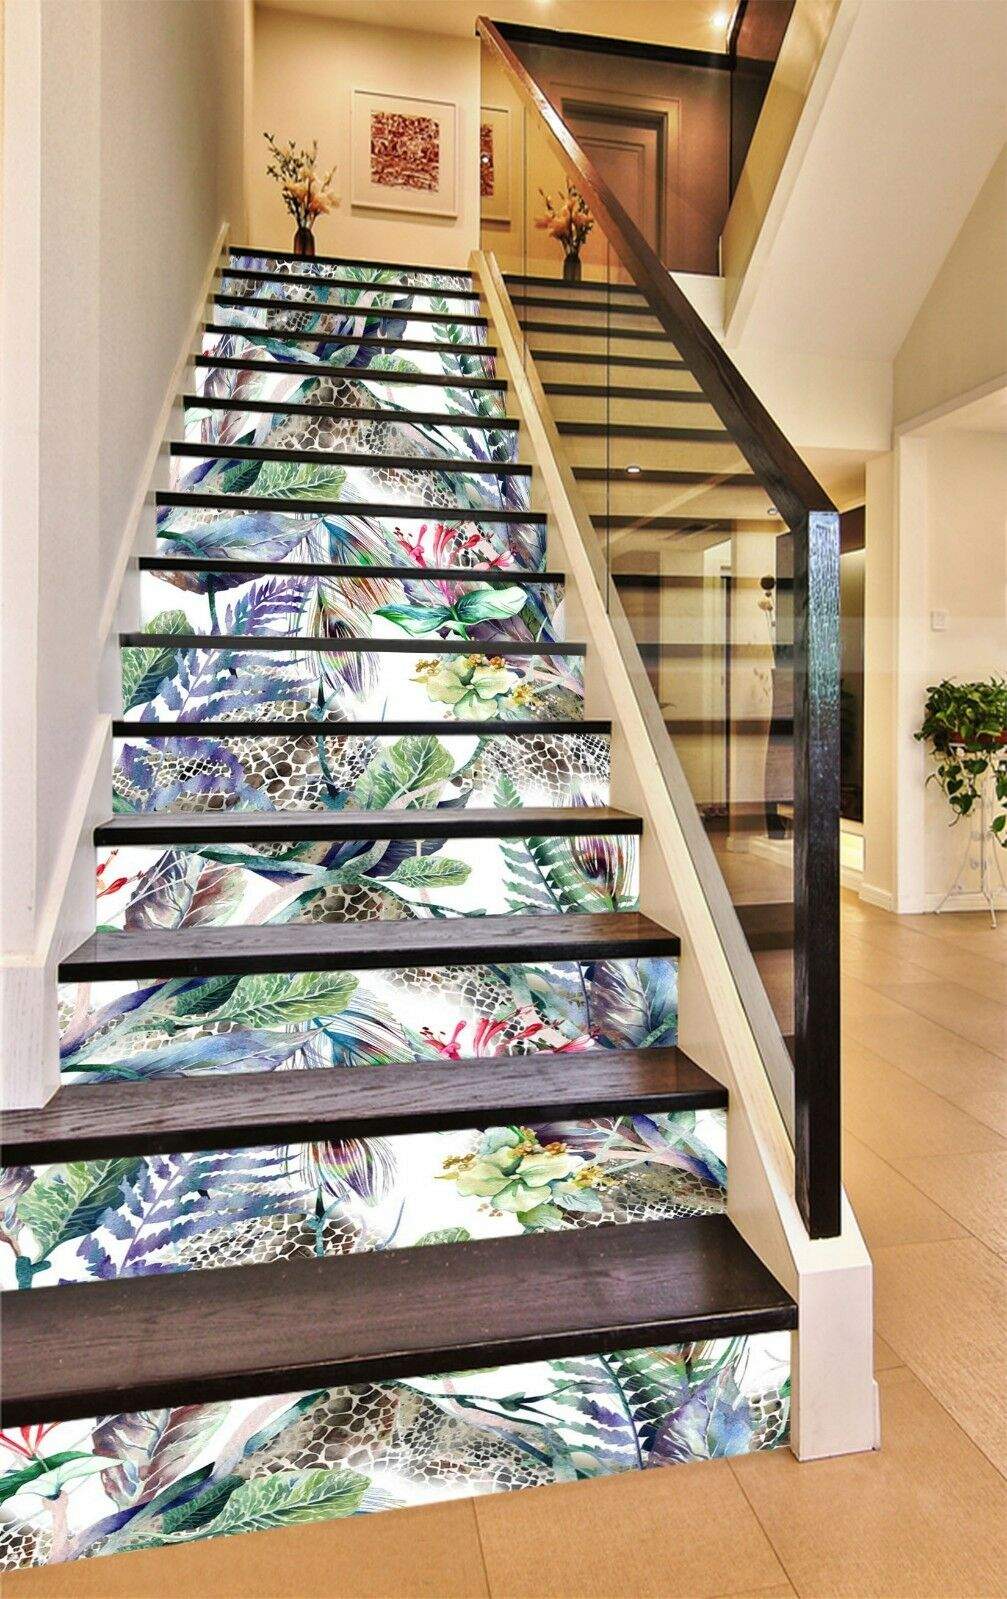 3D Flowers Paint 3 Stair Risers Decoration Photo Mural Vinyl Decal Wallpaper US